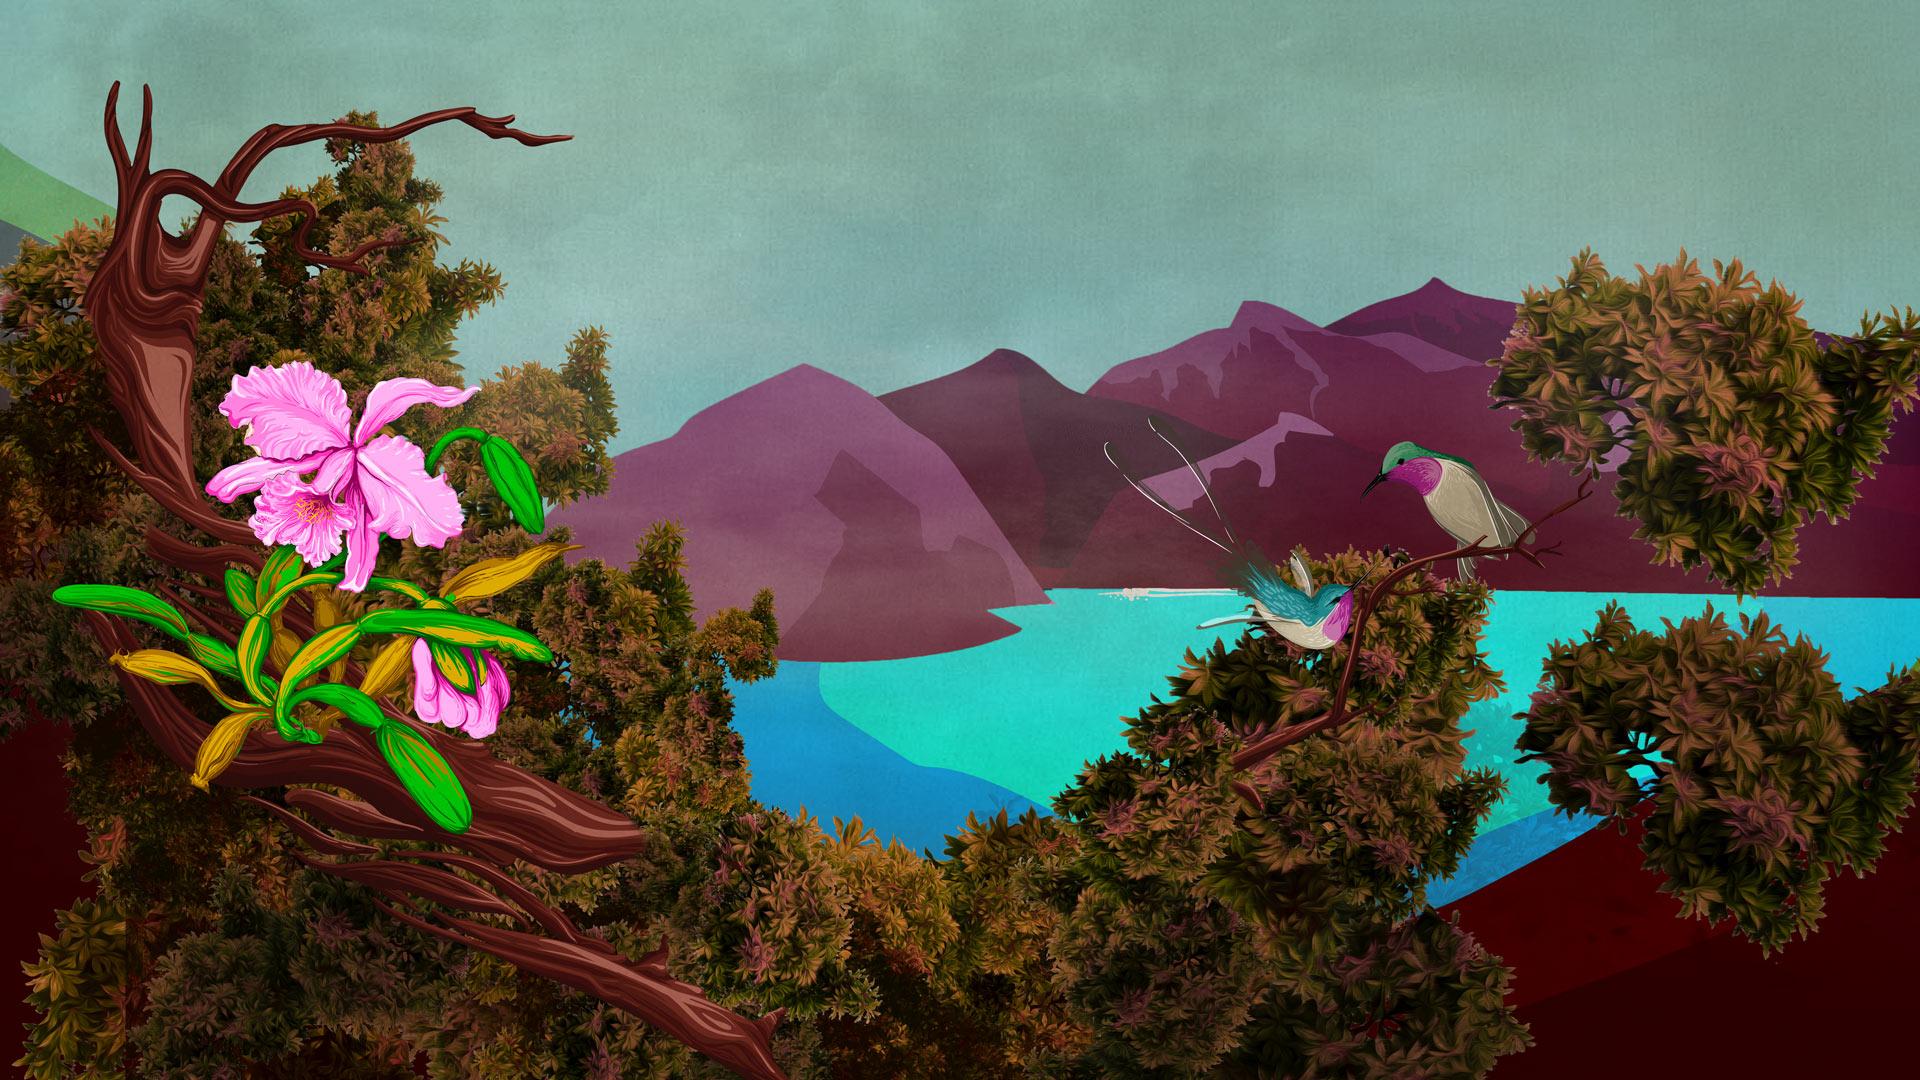 Simposio: Landscape Art of the Americas